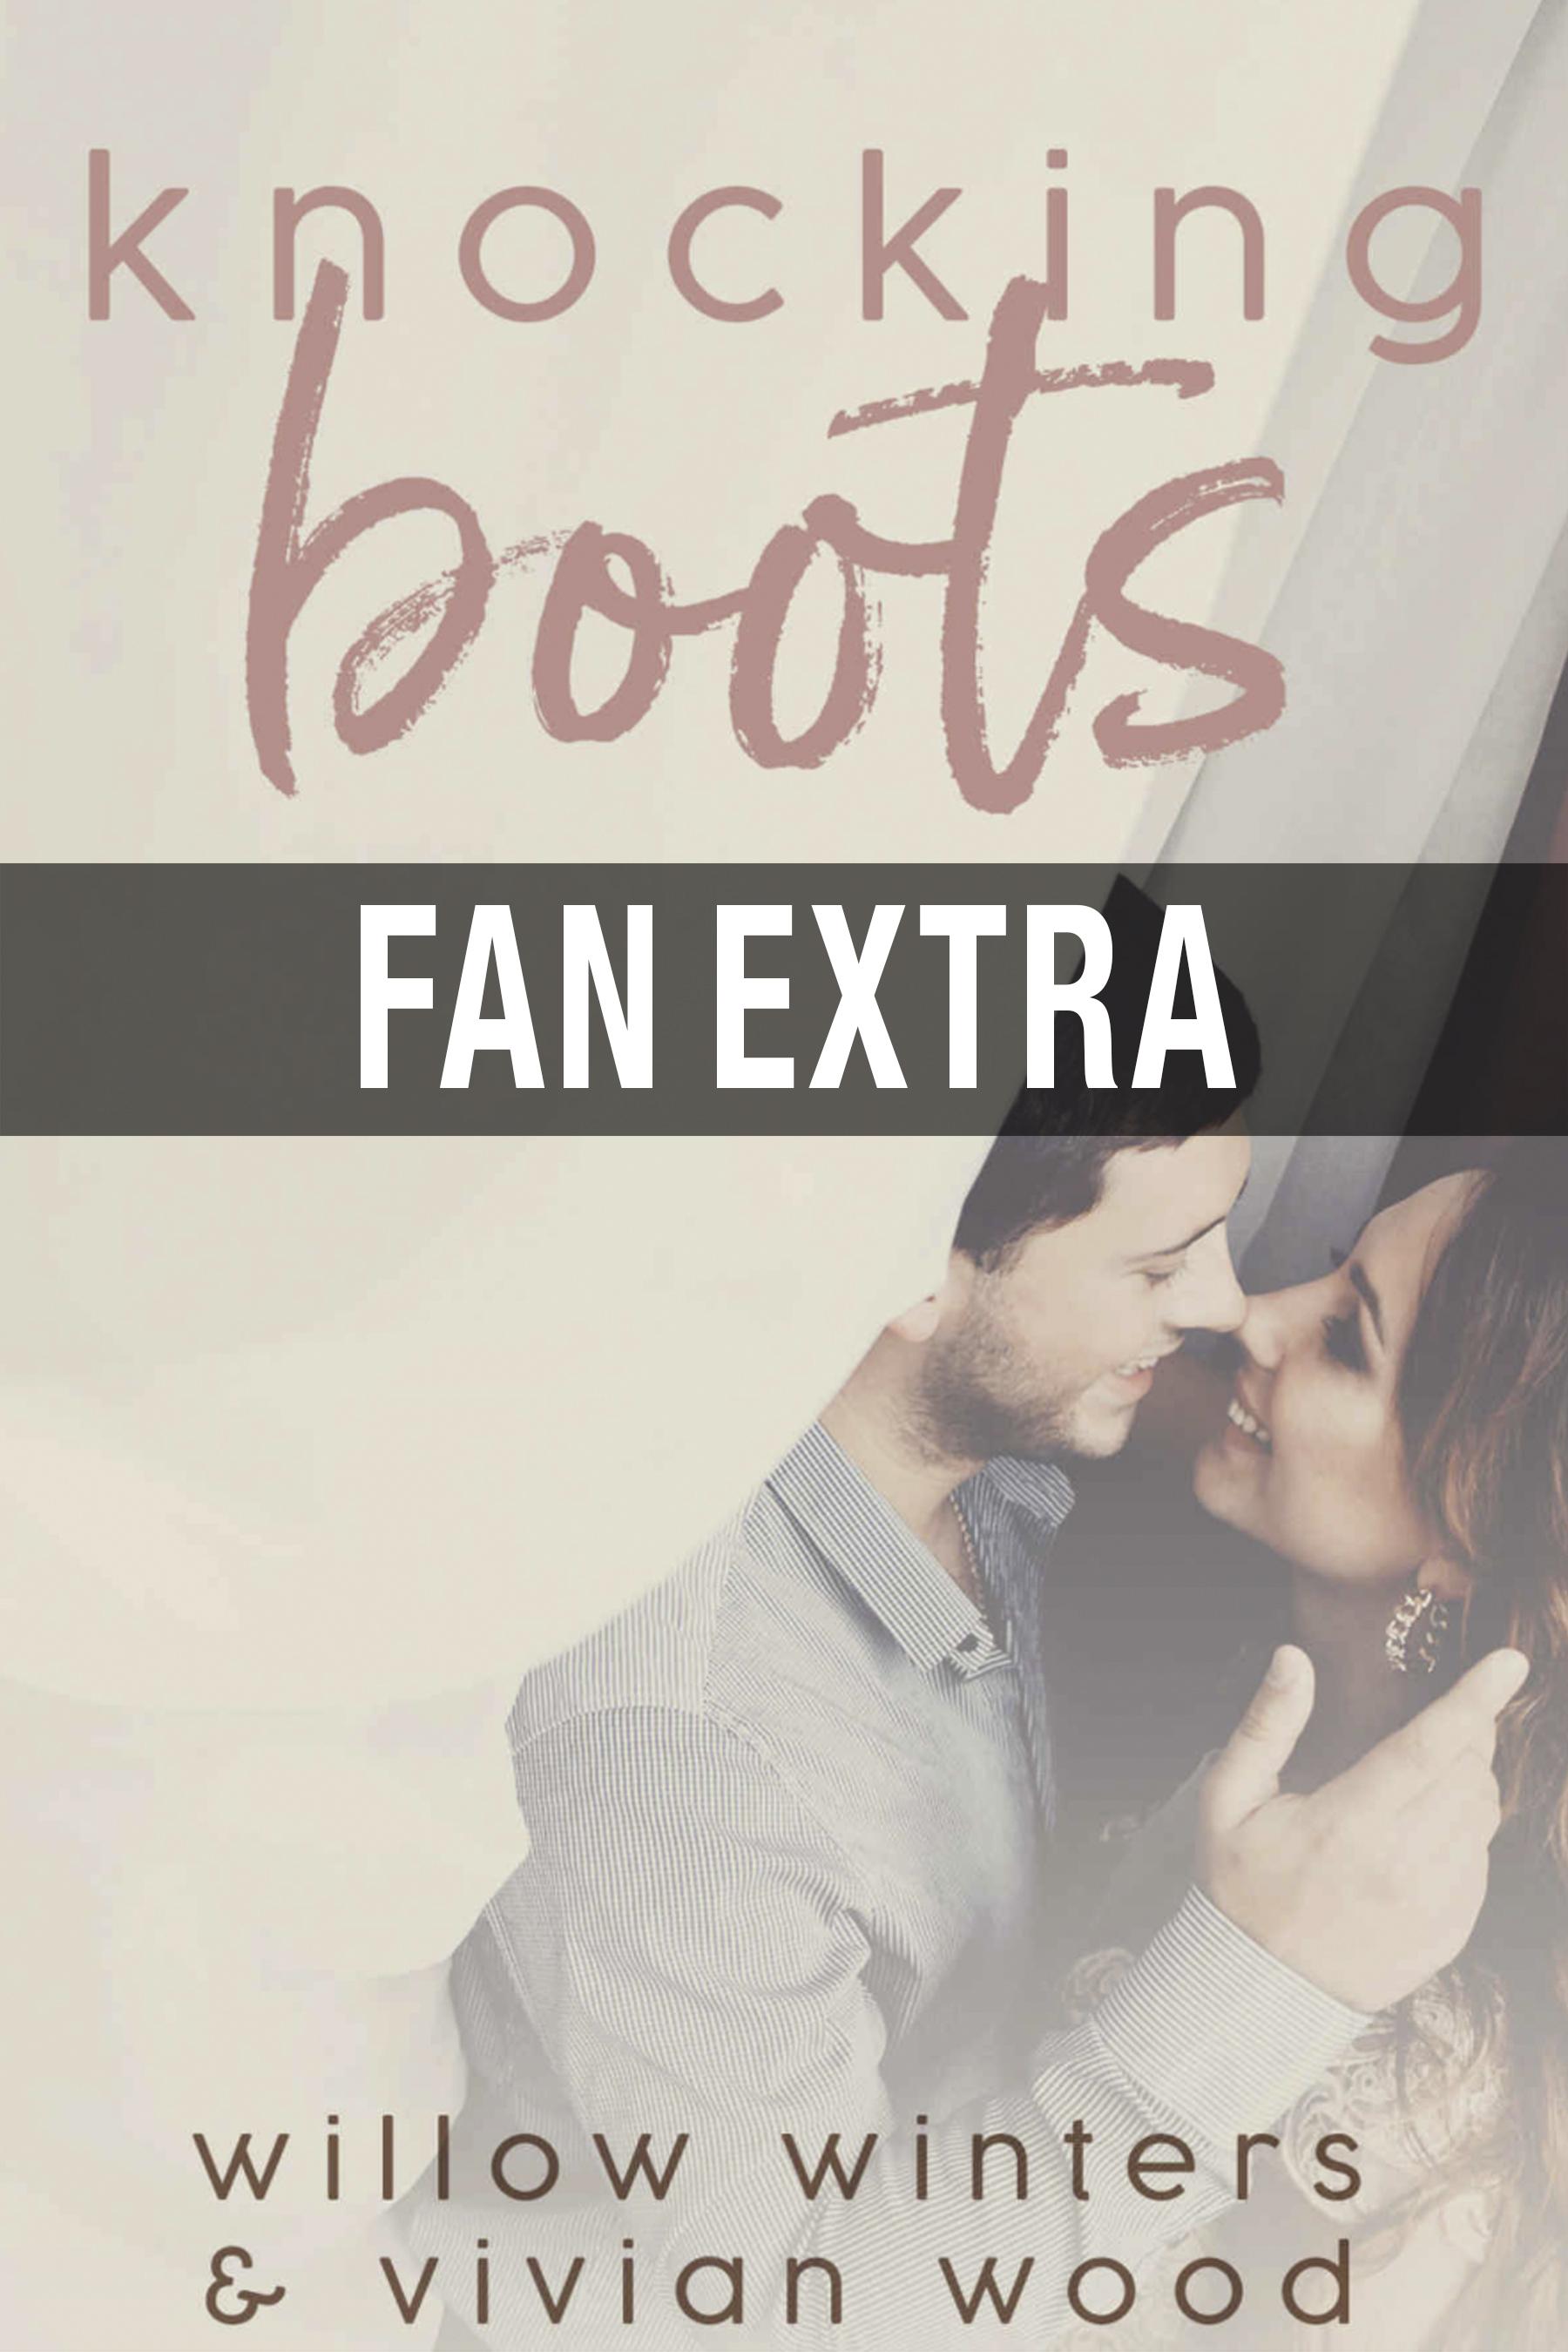 BOOTS_FANXTRA.jpg